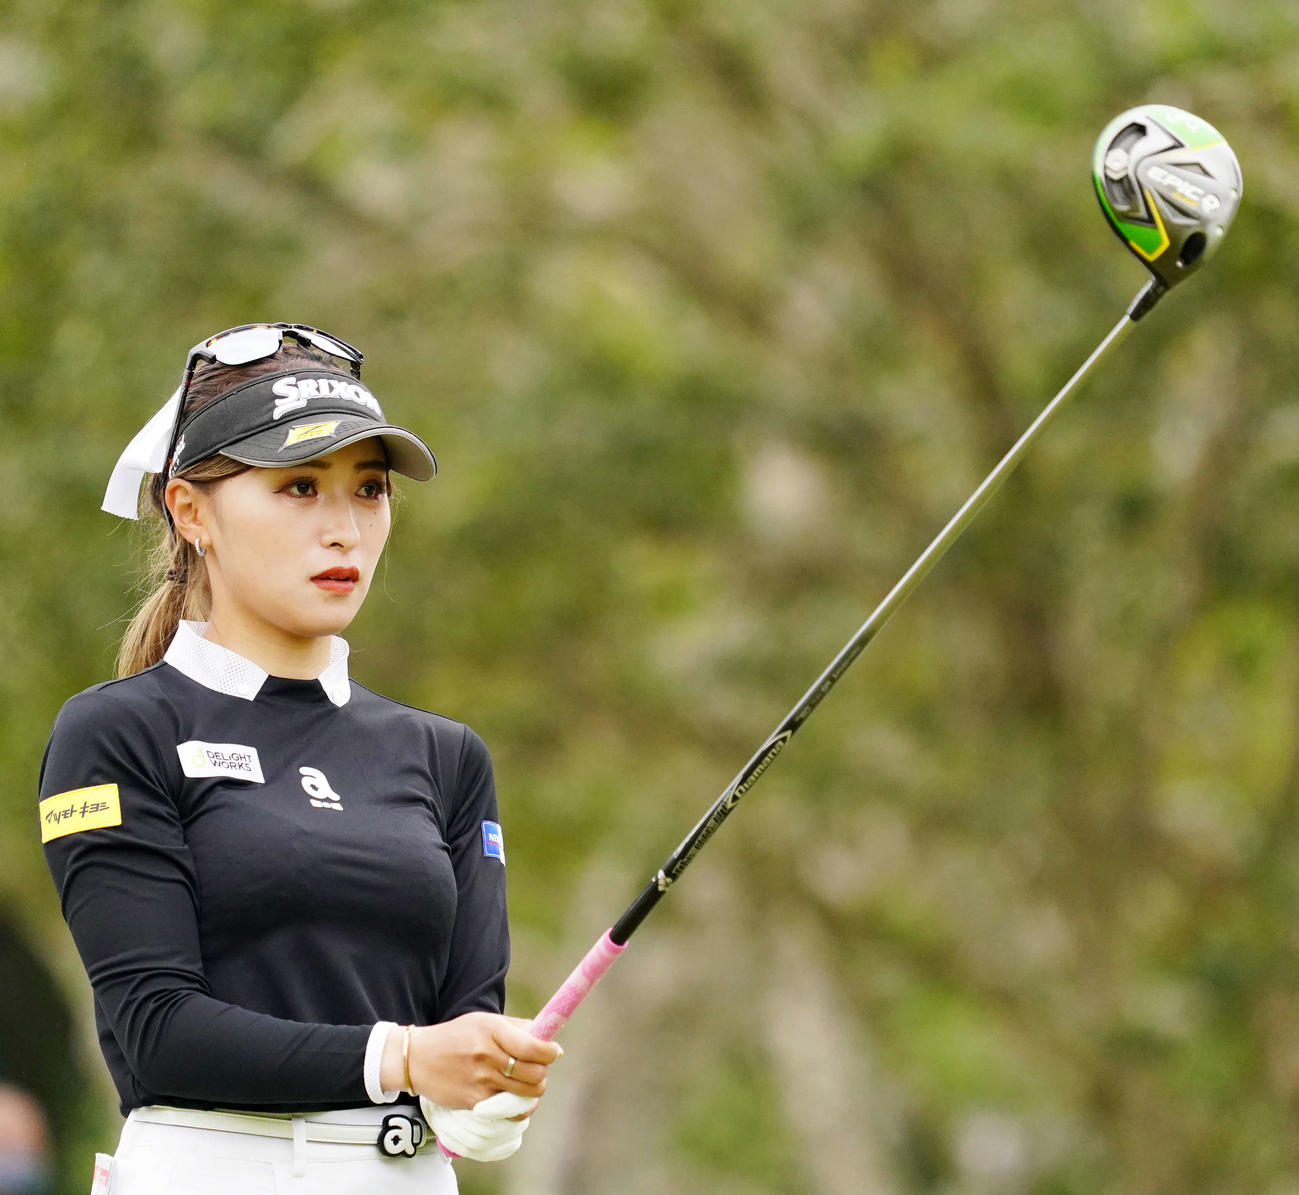 https://www.nikkansports.com/sports/golf/news/img/202104040000109-w1300_16.jpg